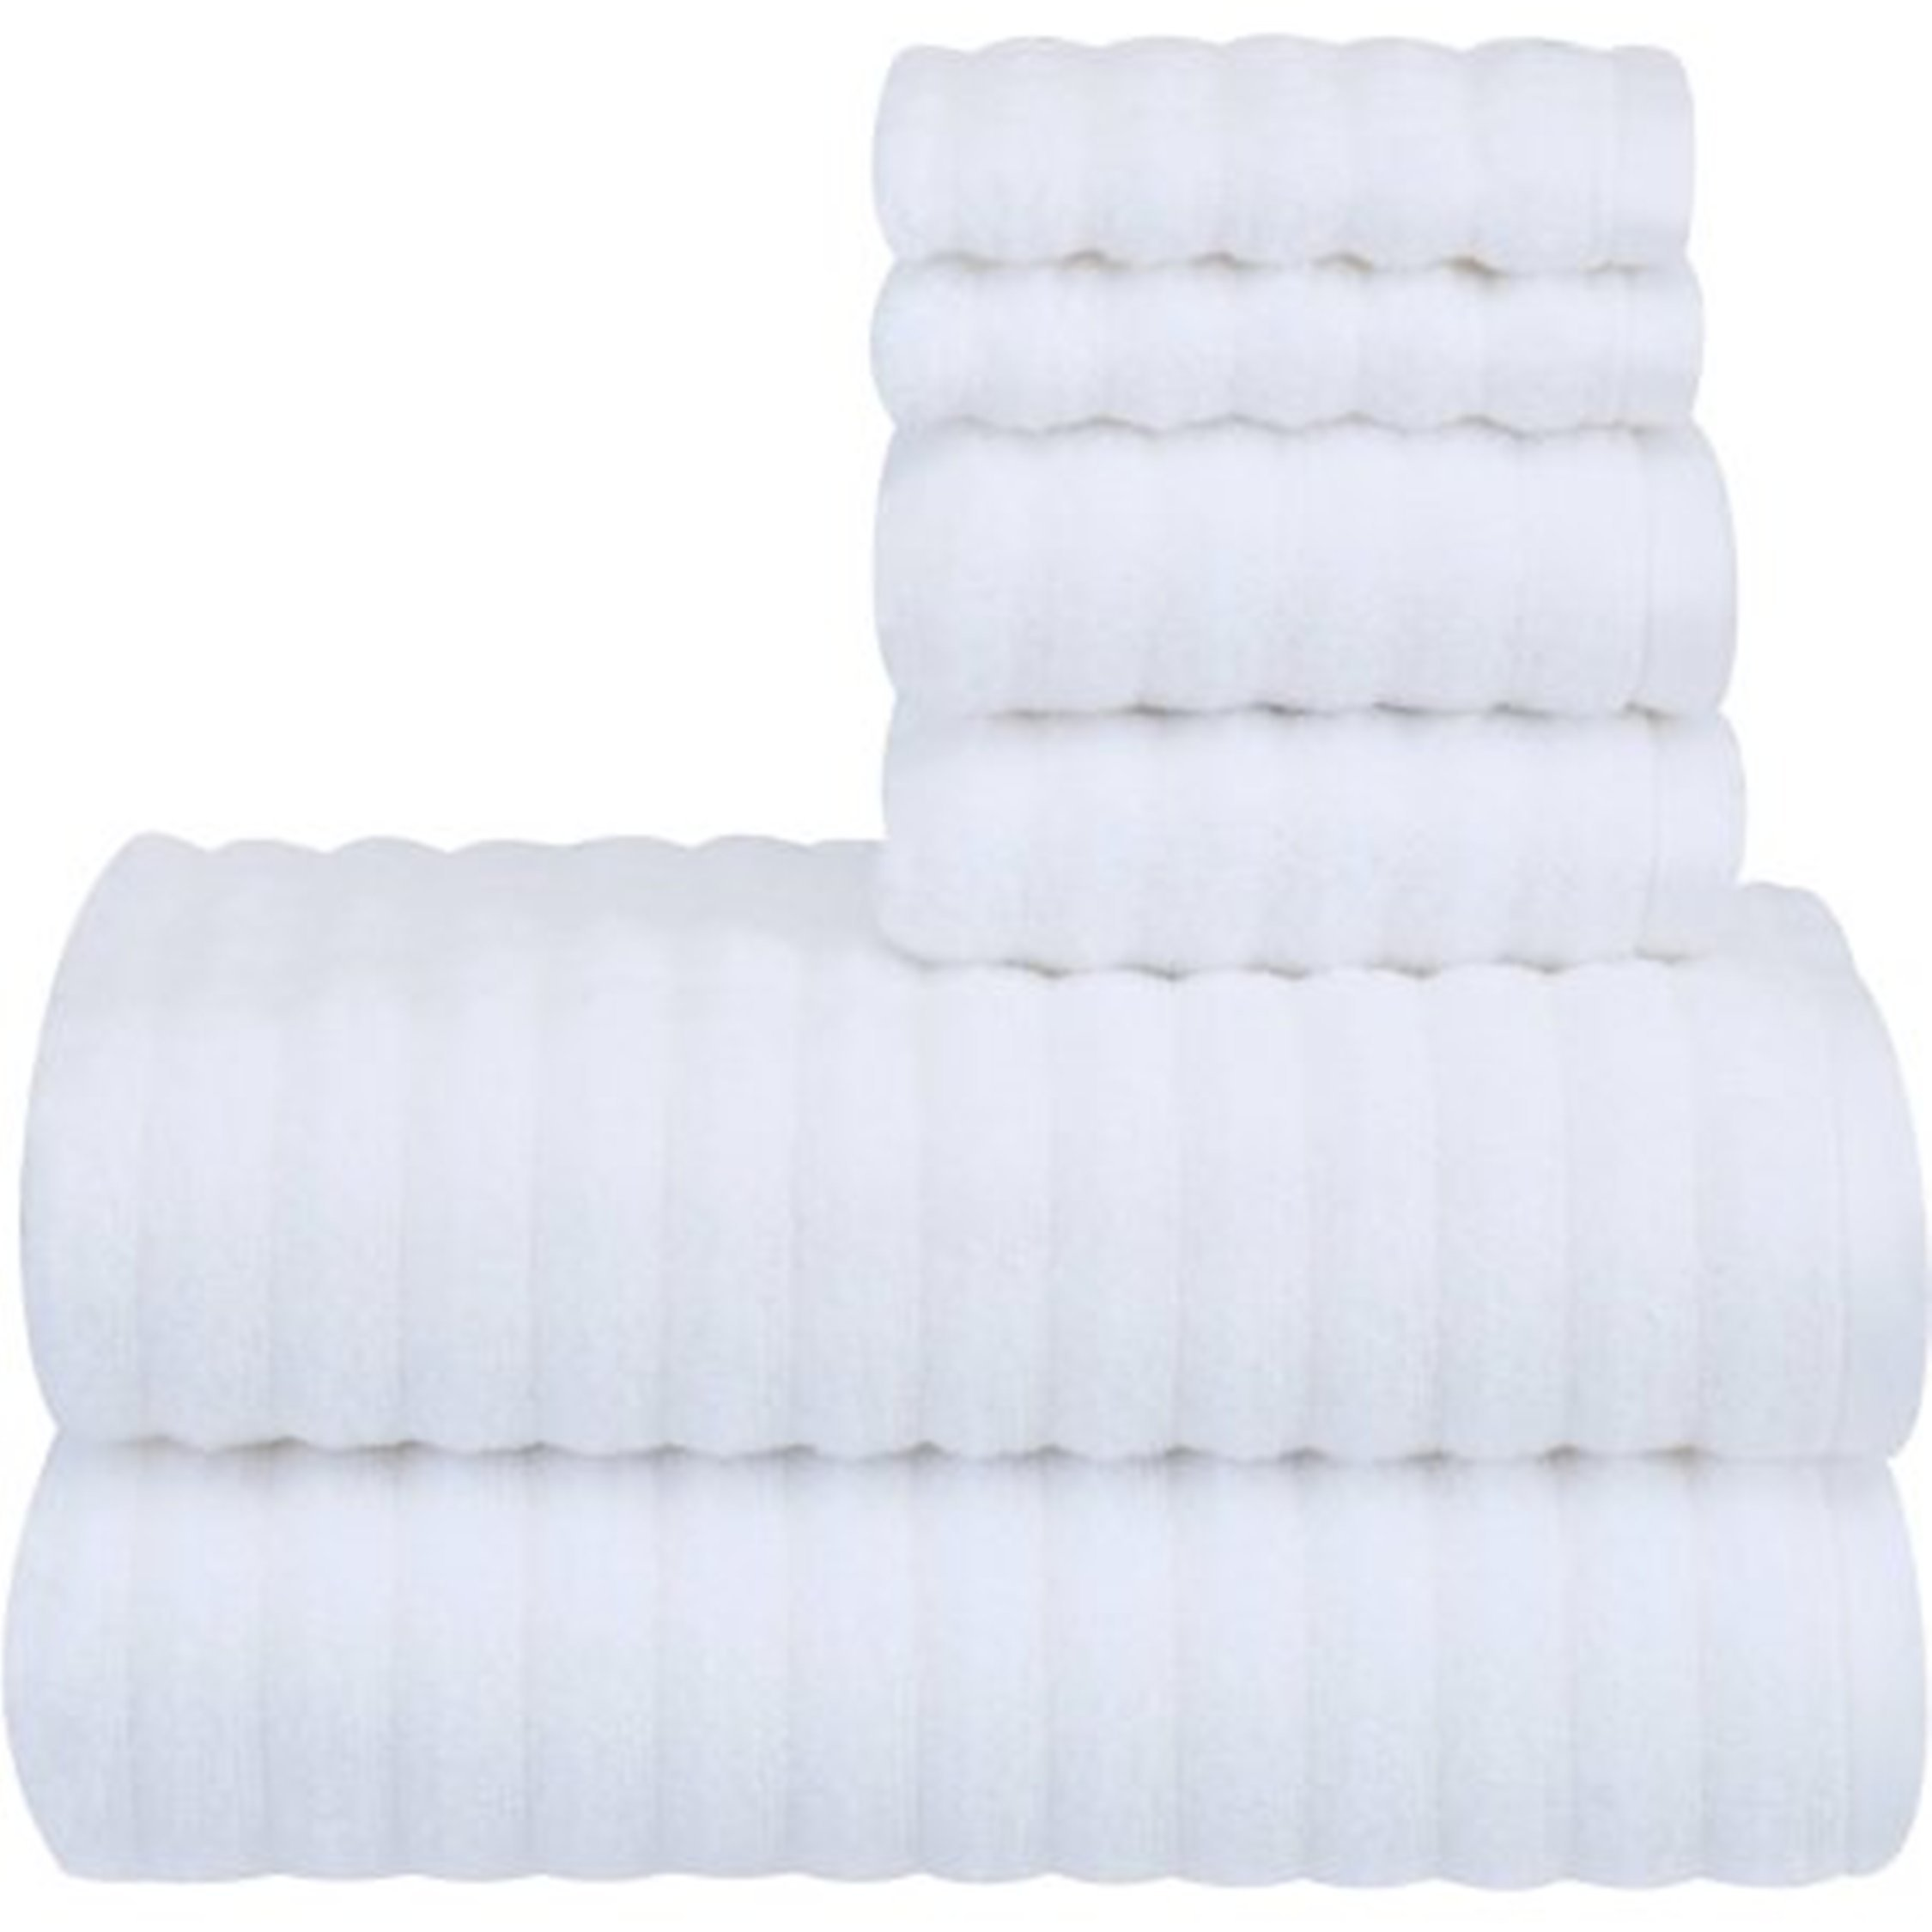 WELSPUN INDIA Performance Texture 6-Piece Bath Towel Set Arctic White